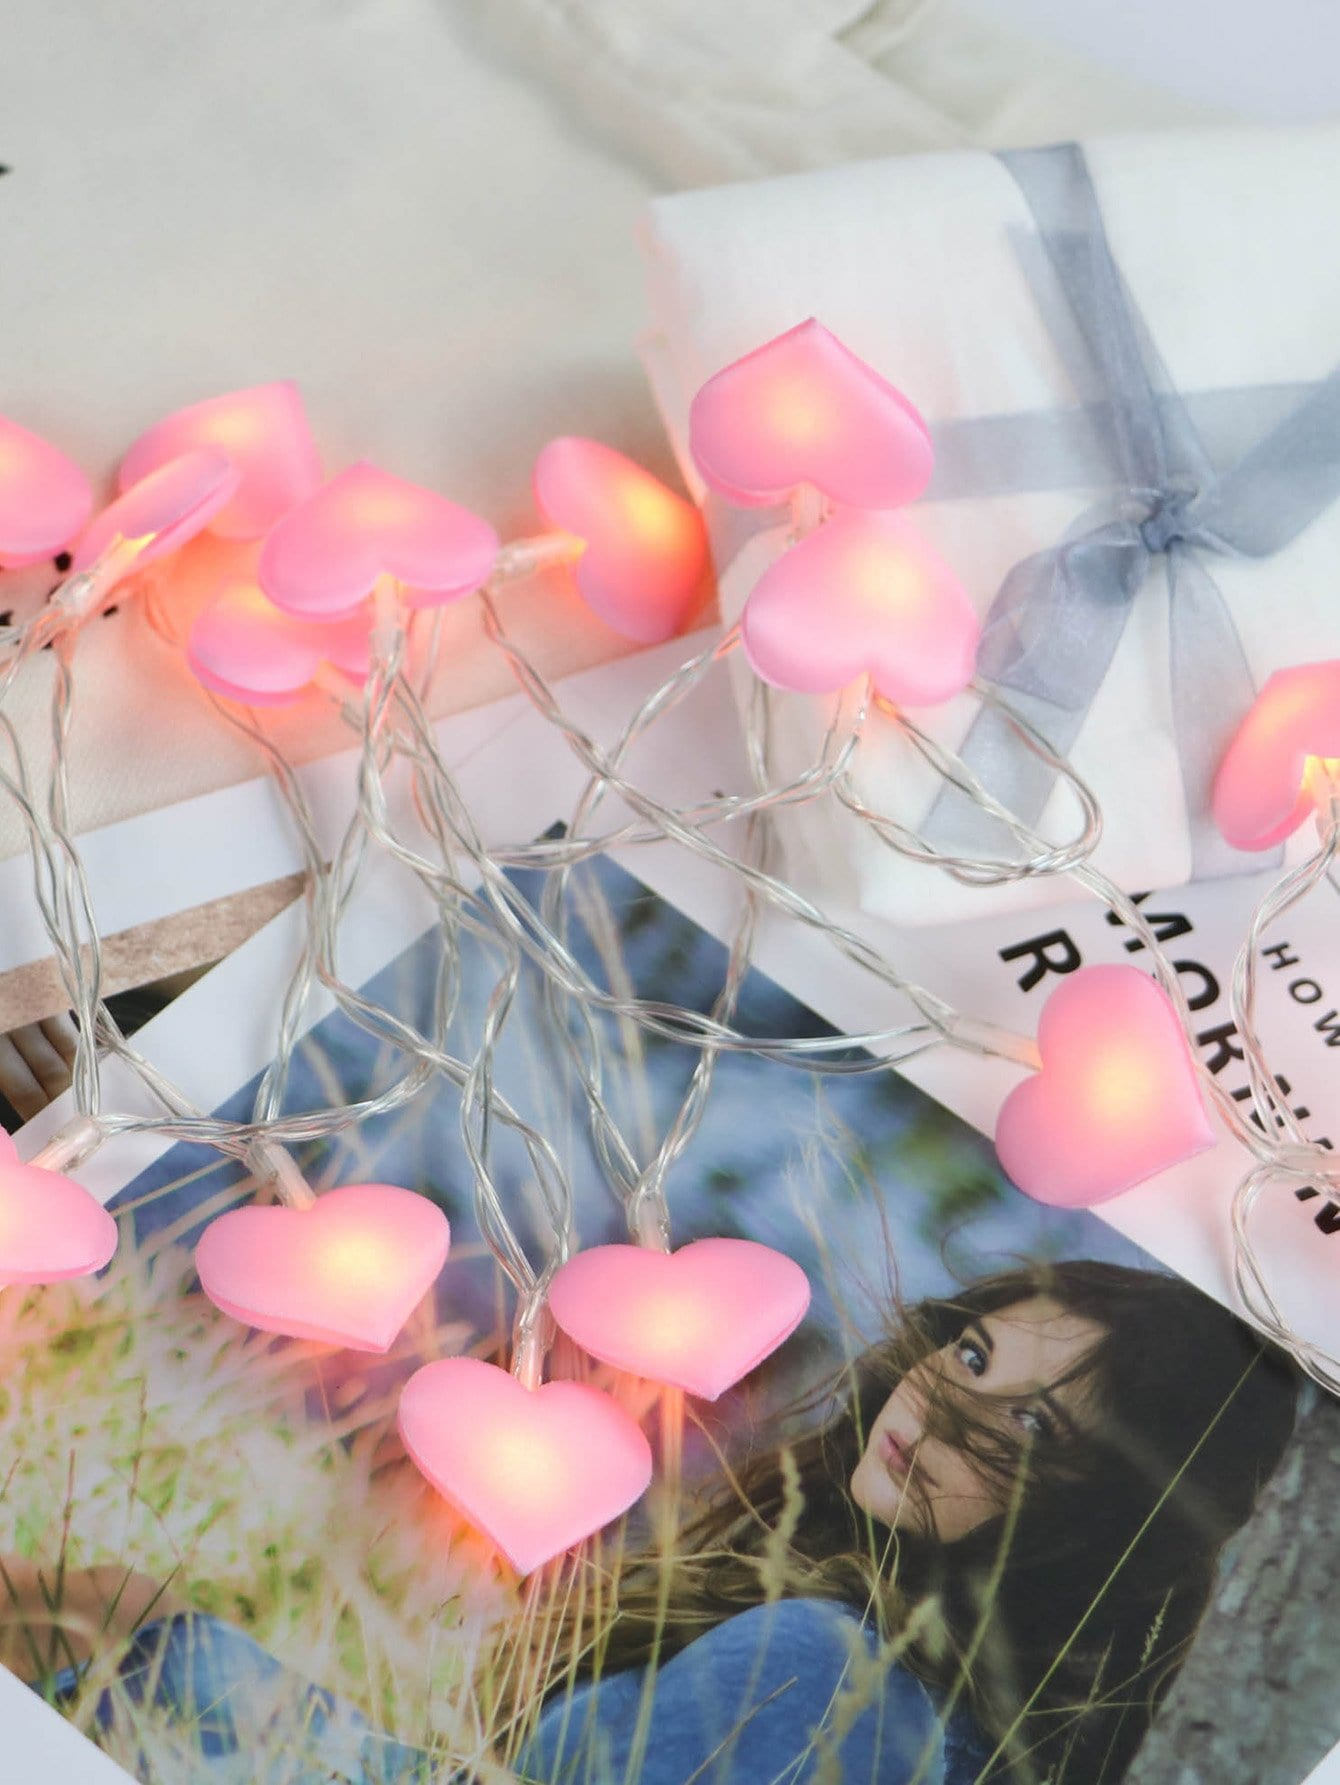 Купить Лампочки 20 шт сердца, null, SheIn